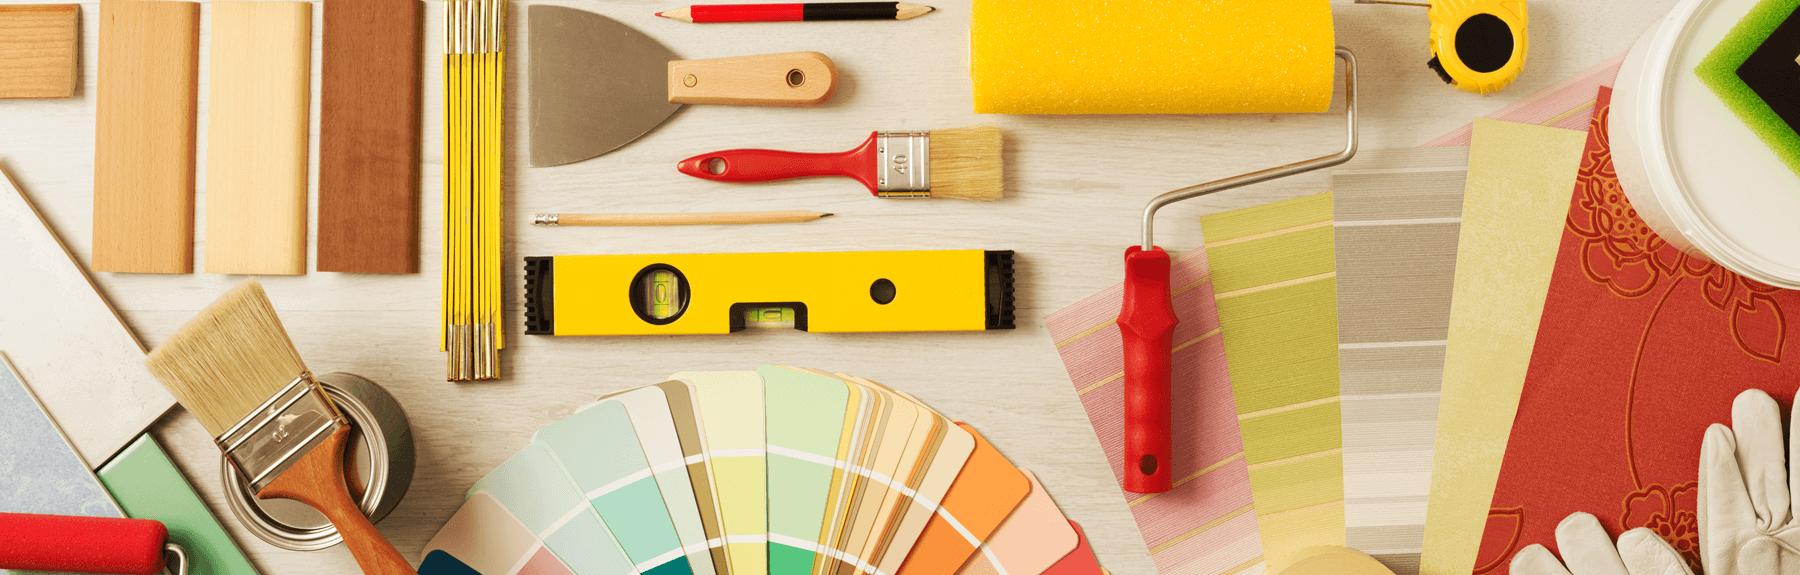 8-ux-tools-design-collaration-justinmind-header